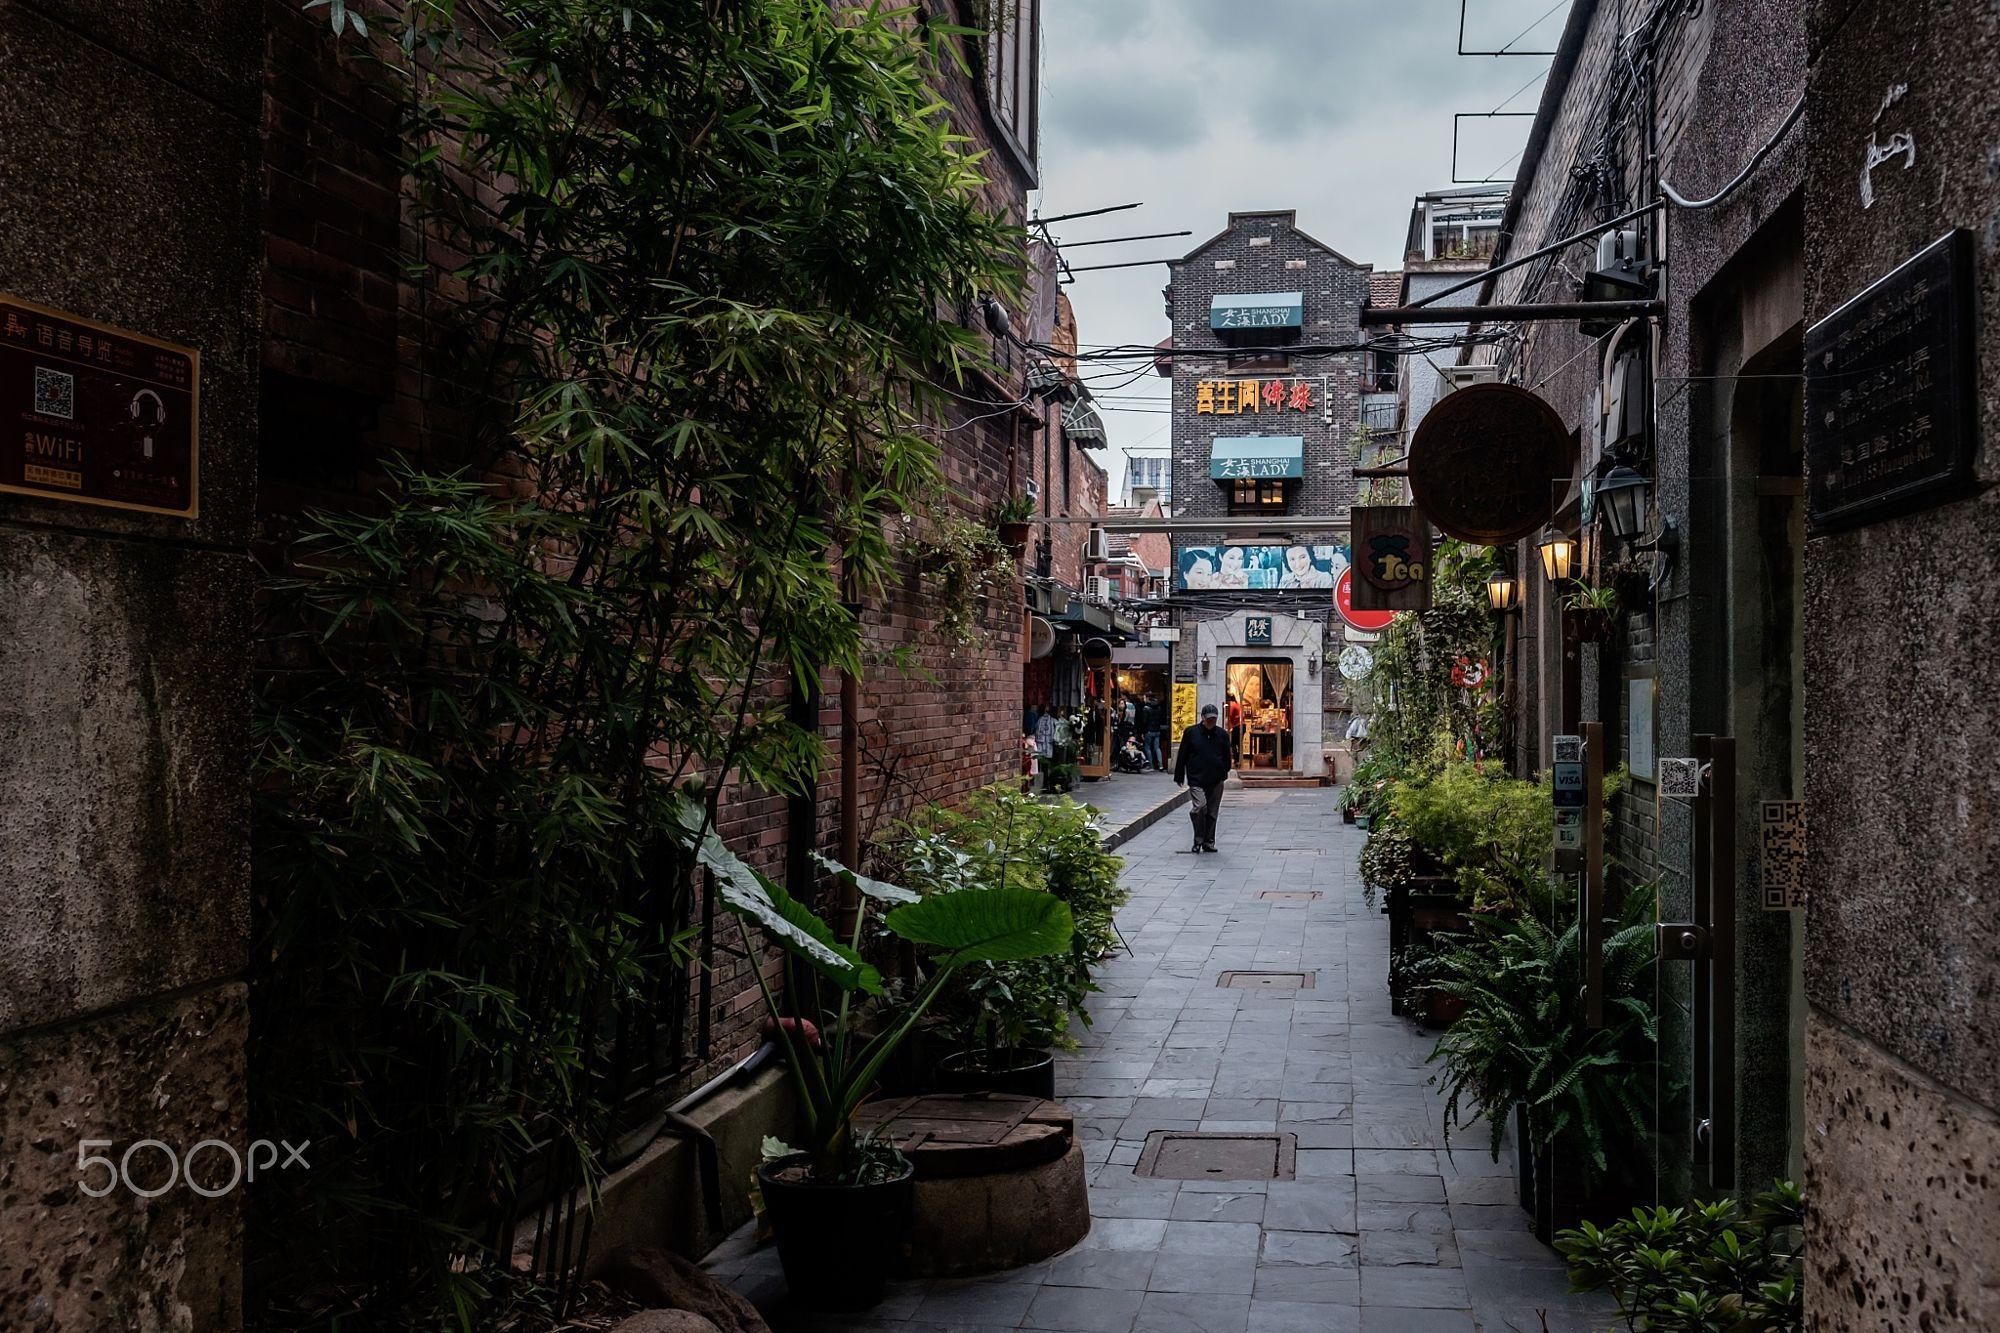 Urban Exploration: old Shanghai feeling by yfunei https://t.co/taBuWKk1fn | #500px #photography #photos https://t.co/nH35pJ1SXd #followme #photography